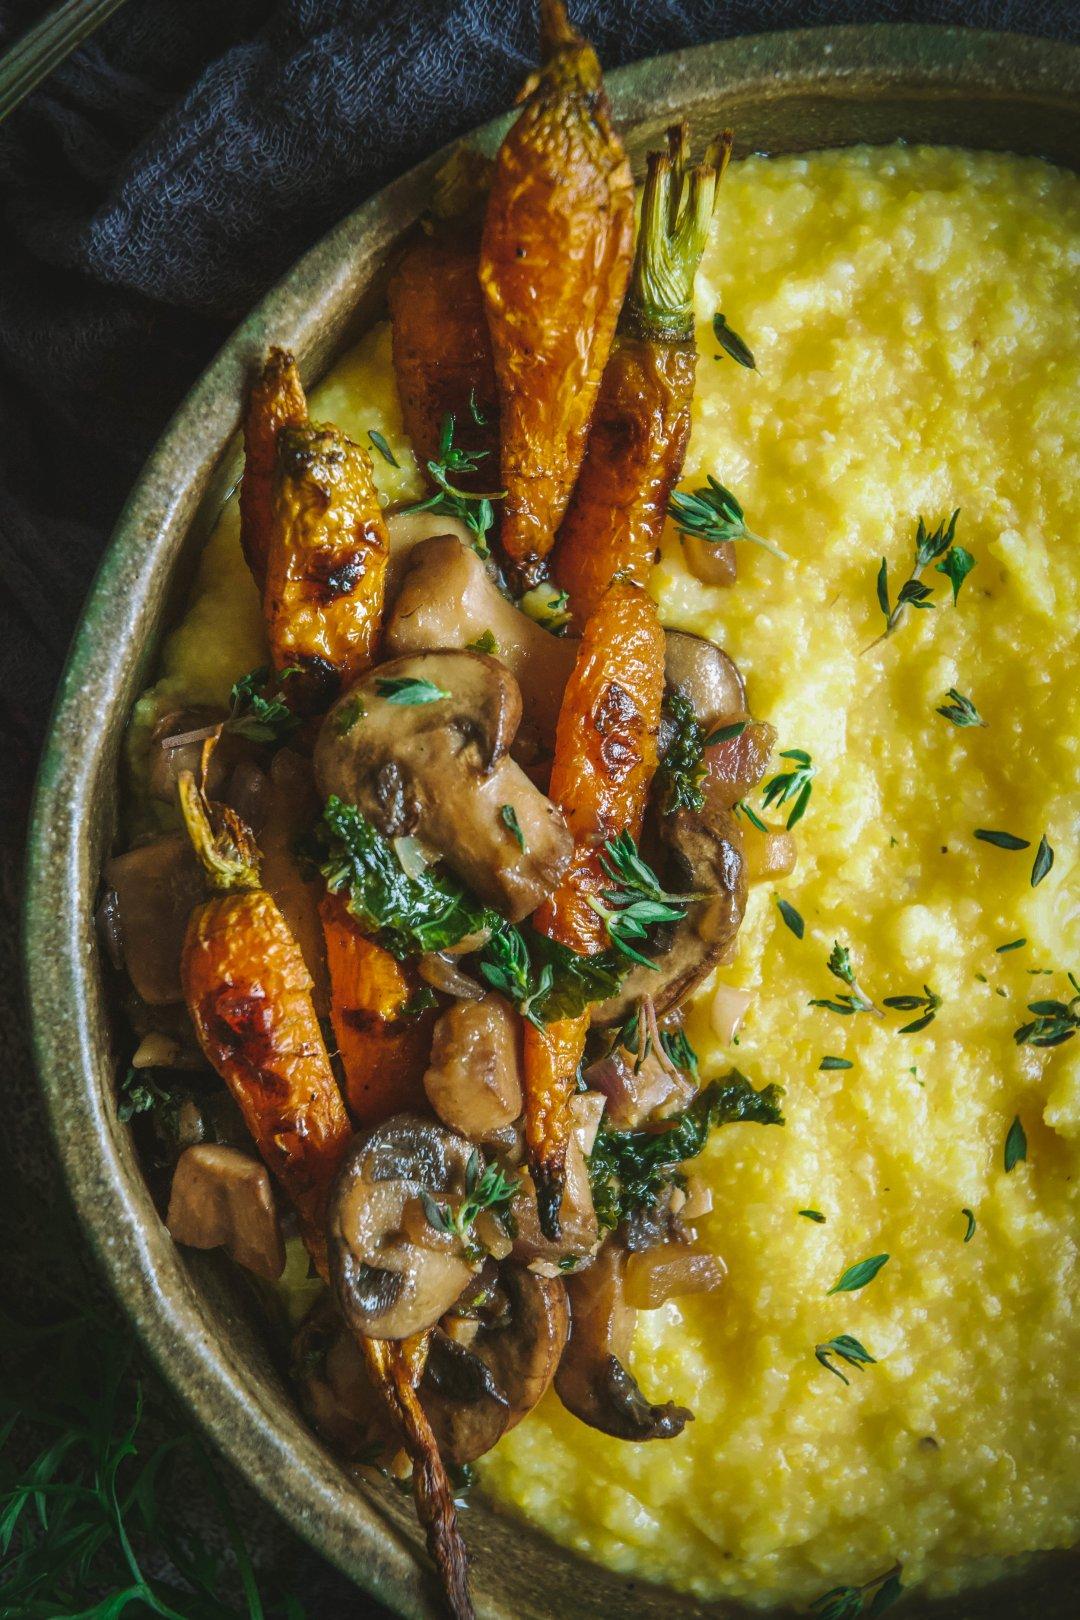 Roasted carrots and mushrooms over polenta